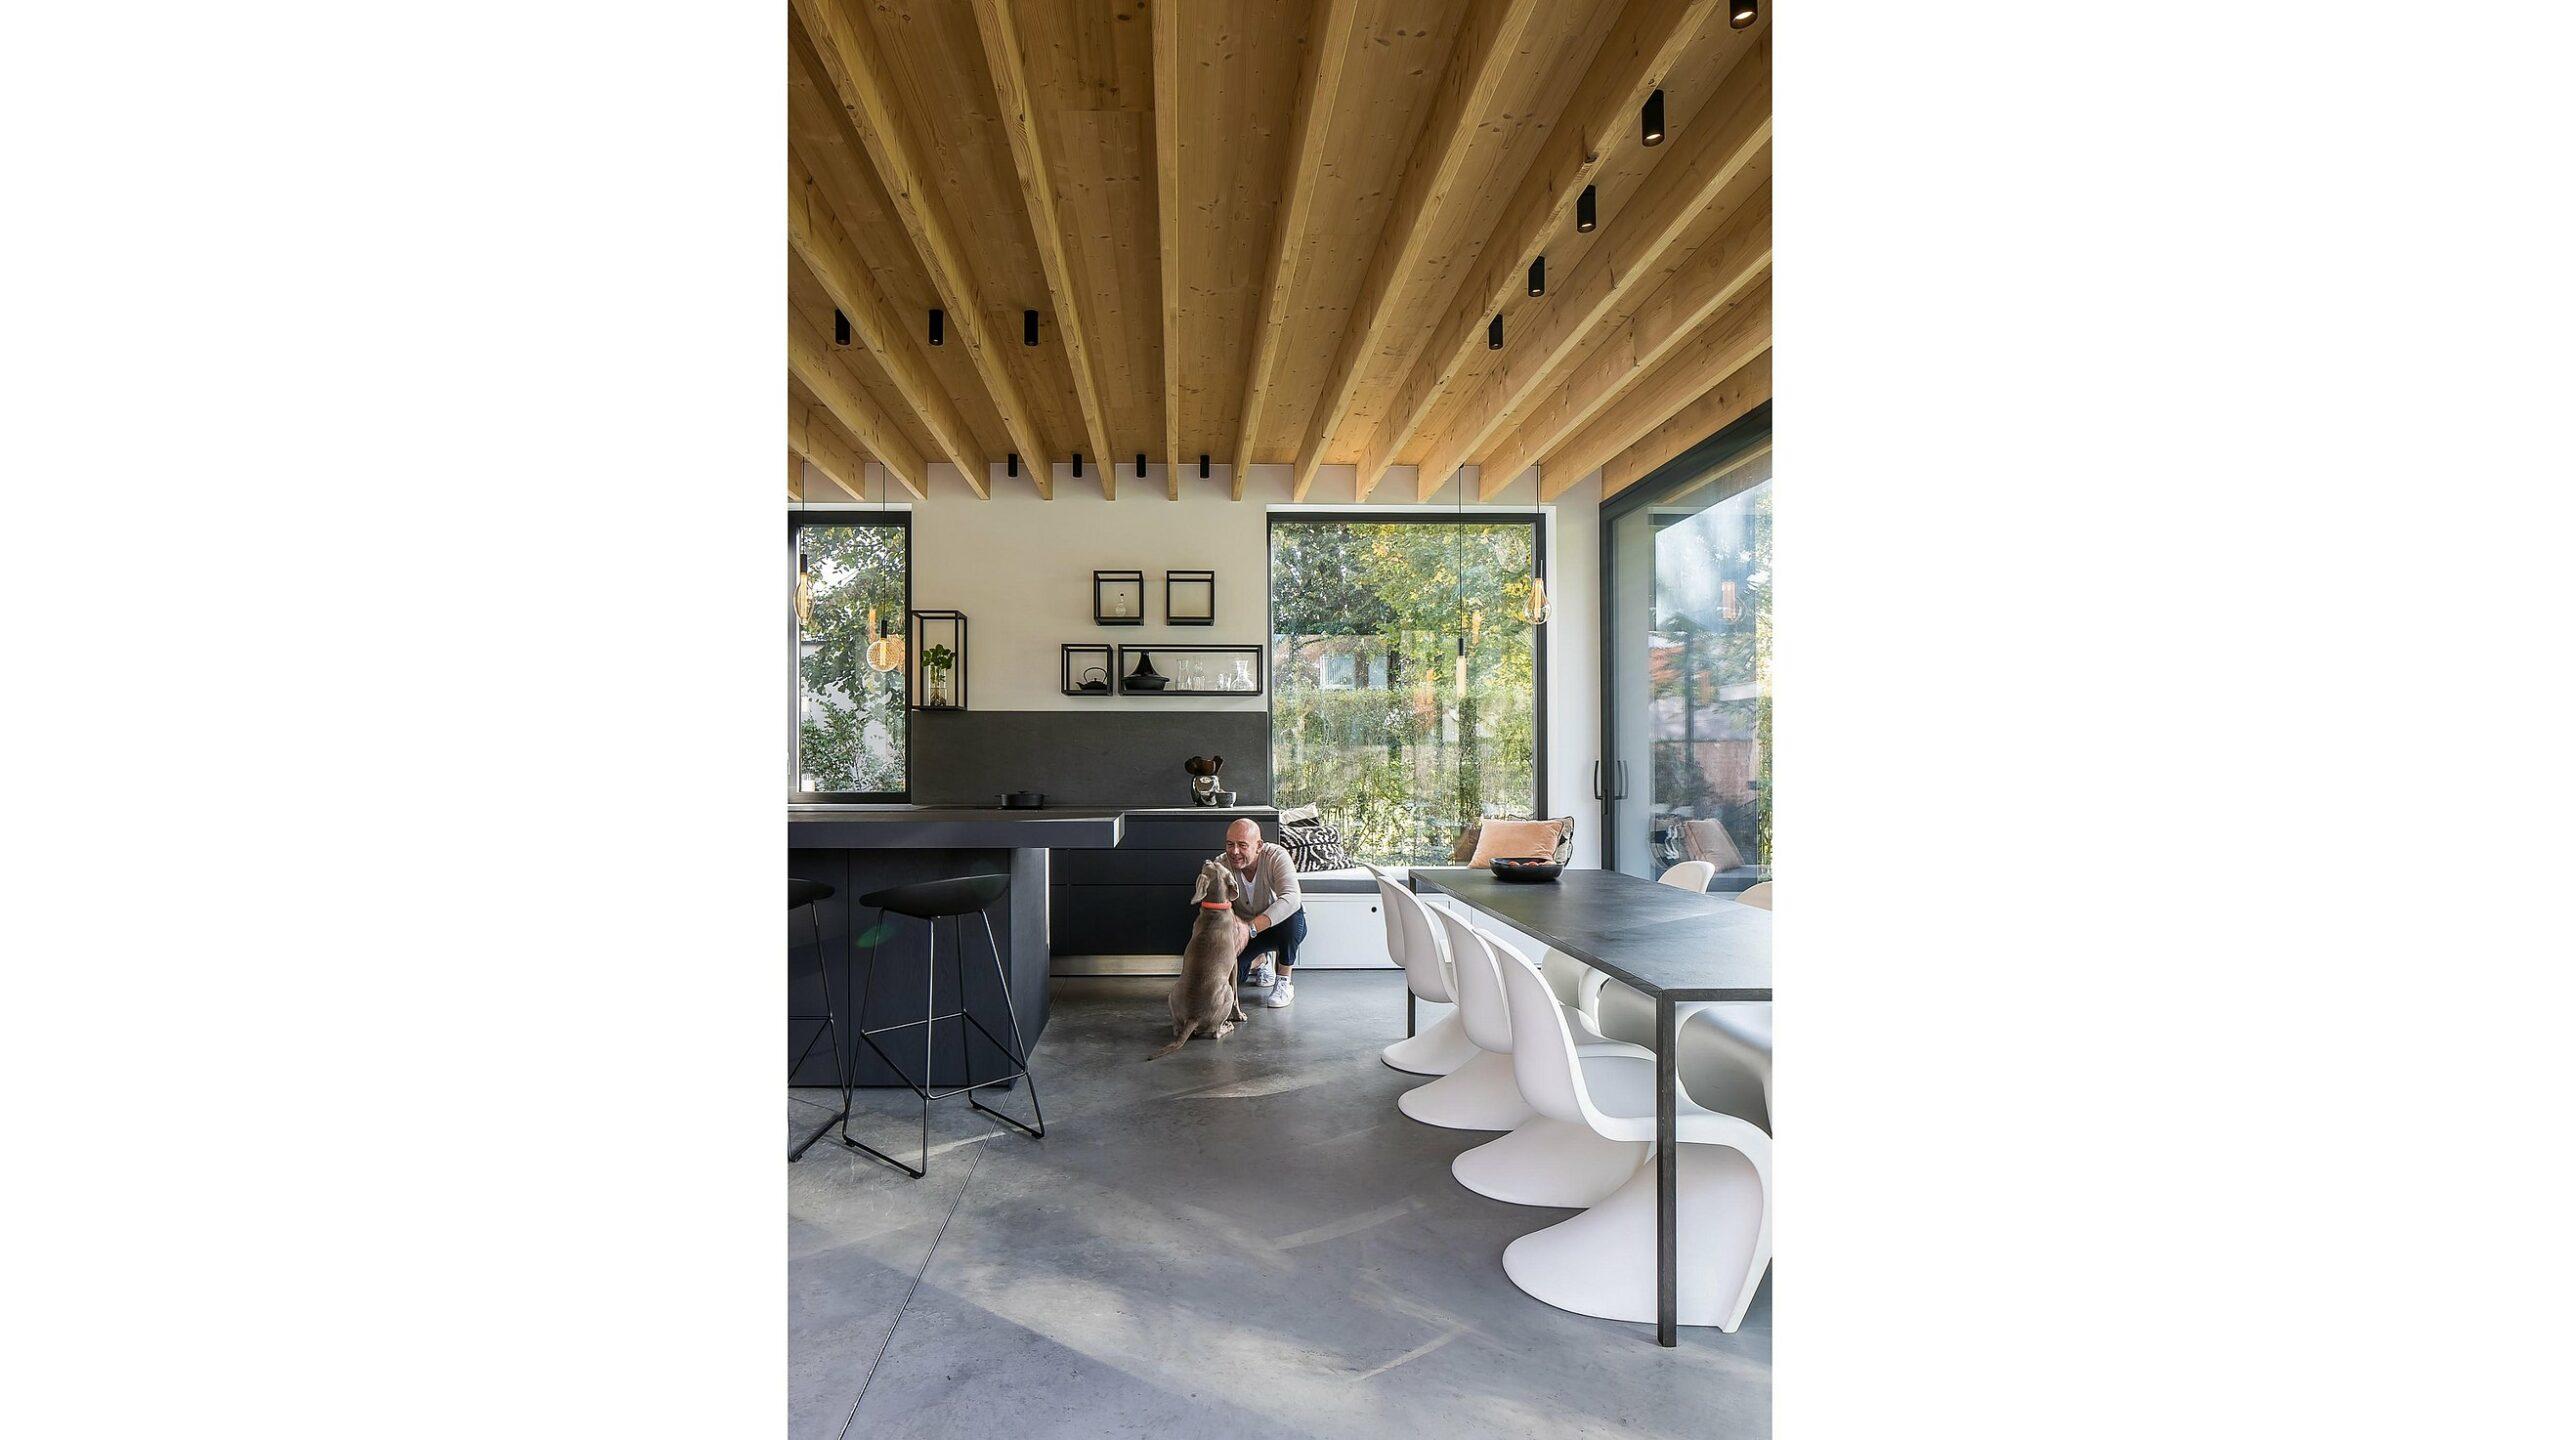 csm bulthaup ligna recta cafeine black oak 03 9c11a54121 scaled | Baeyens & Beck architecten Gent | architect nieuwbouw renovatie interieur | high end | architectenbureau